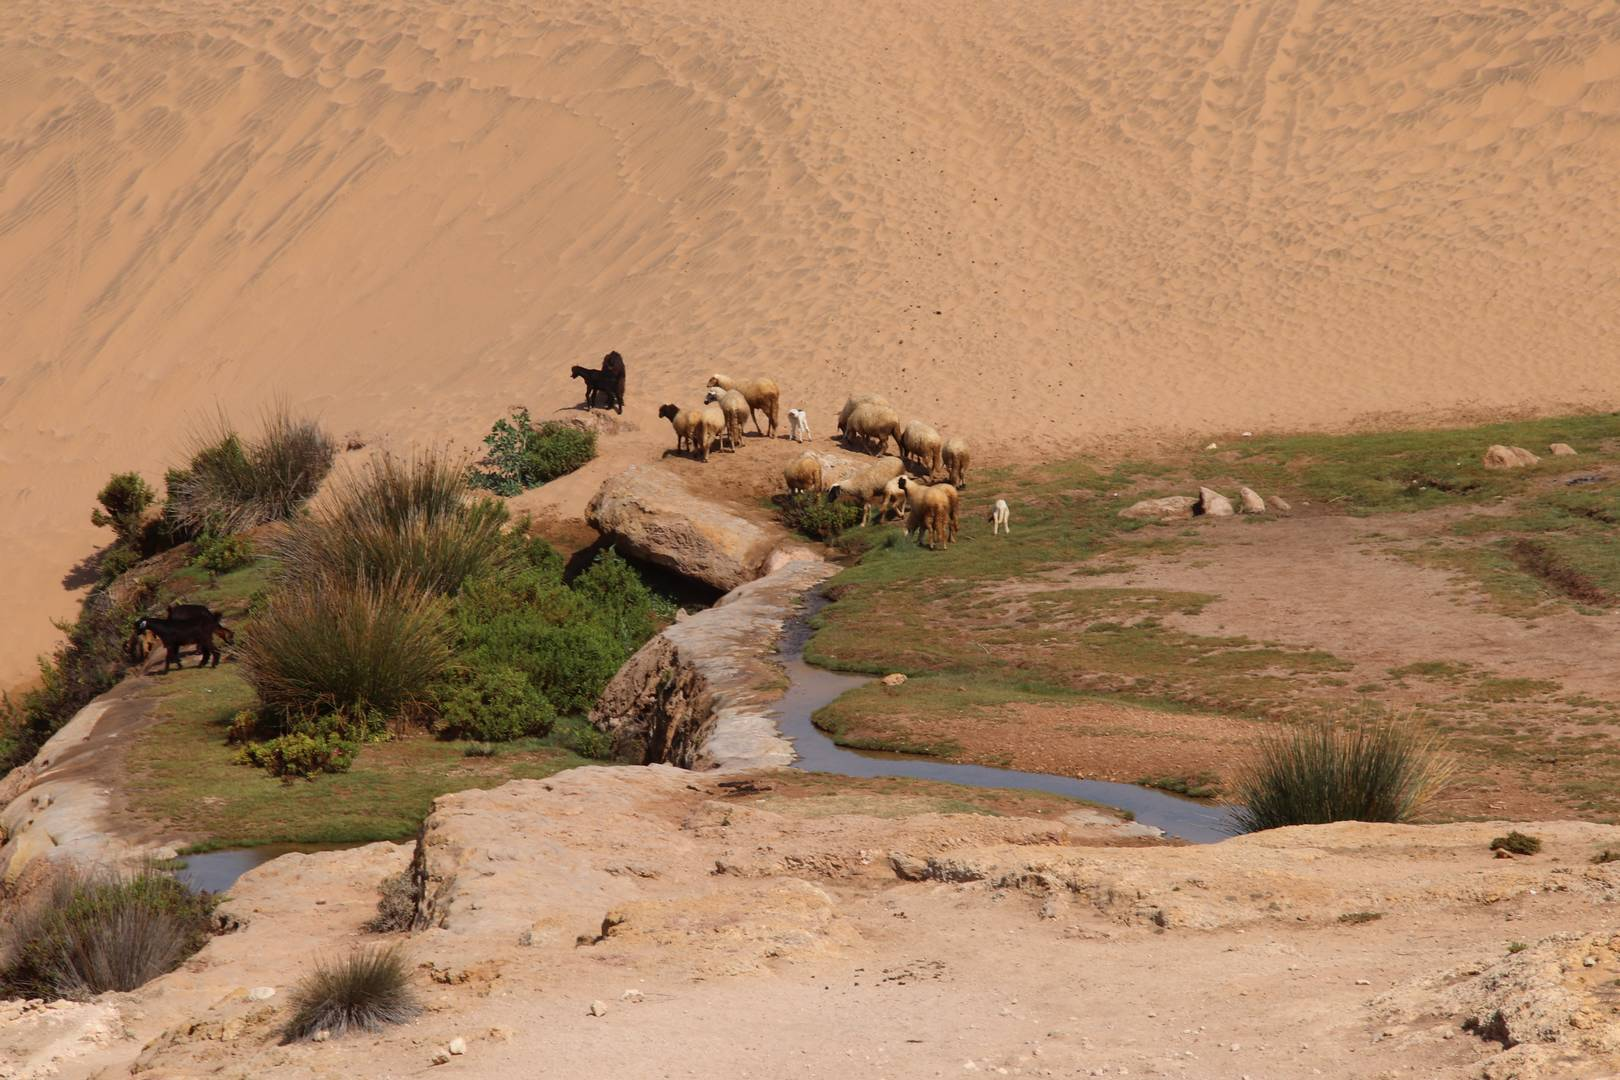 Maroc - Cascades de Sidi M'barek au Sud d'Essaouira